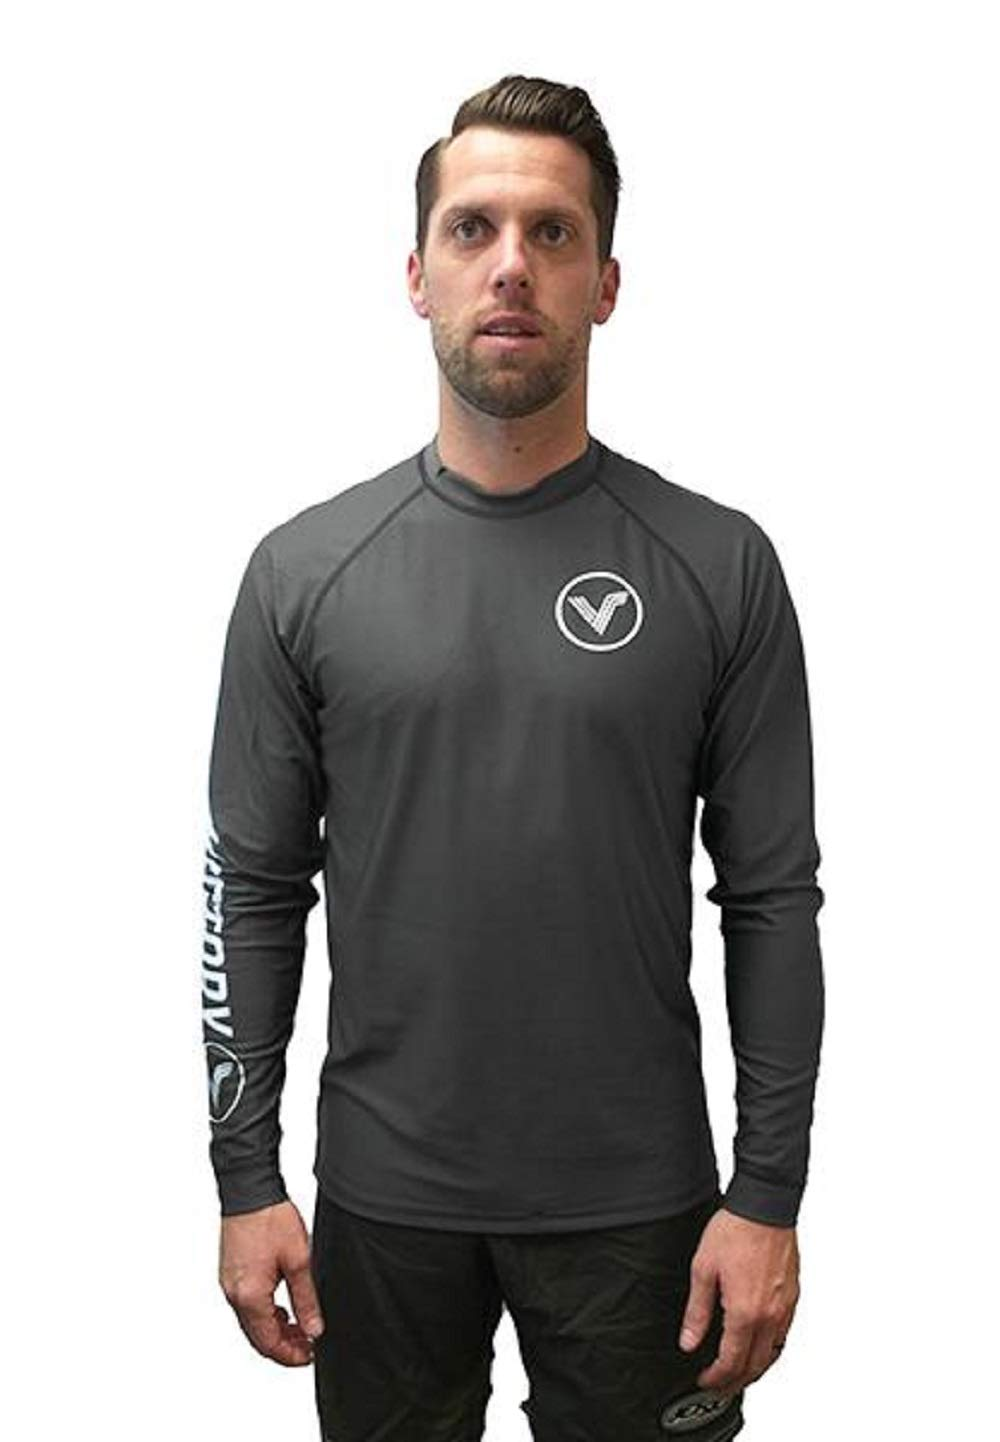 KoreDry Victory Men's Long Sleeve T-Shirt - Water-Resistant UPF 50+ Sun Protection/Block, Medium, Charcoal Gray